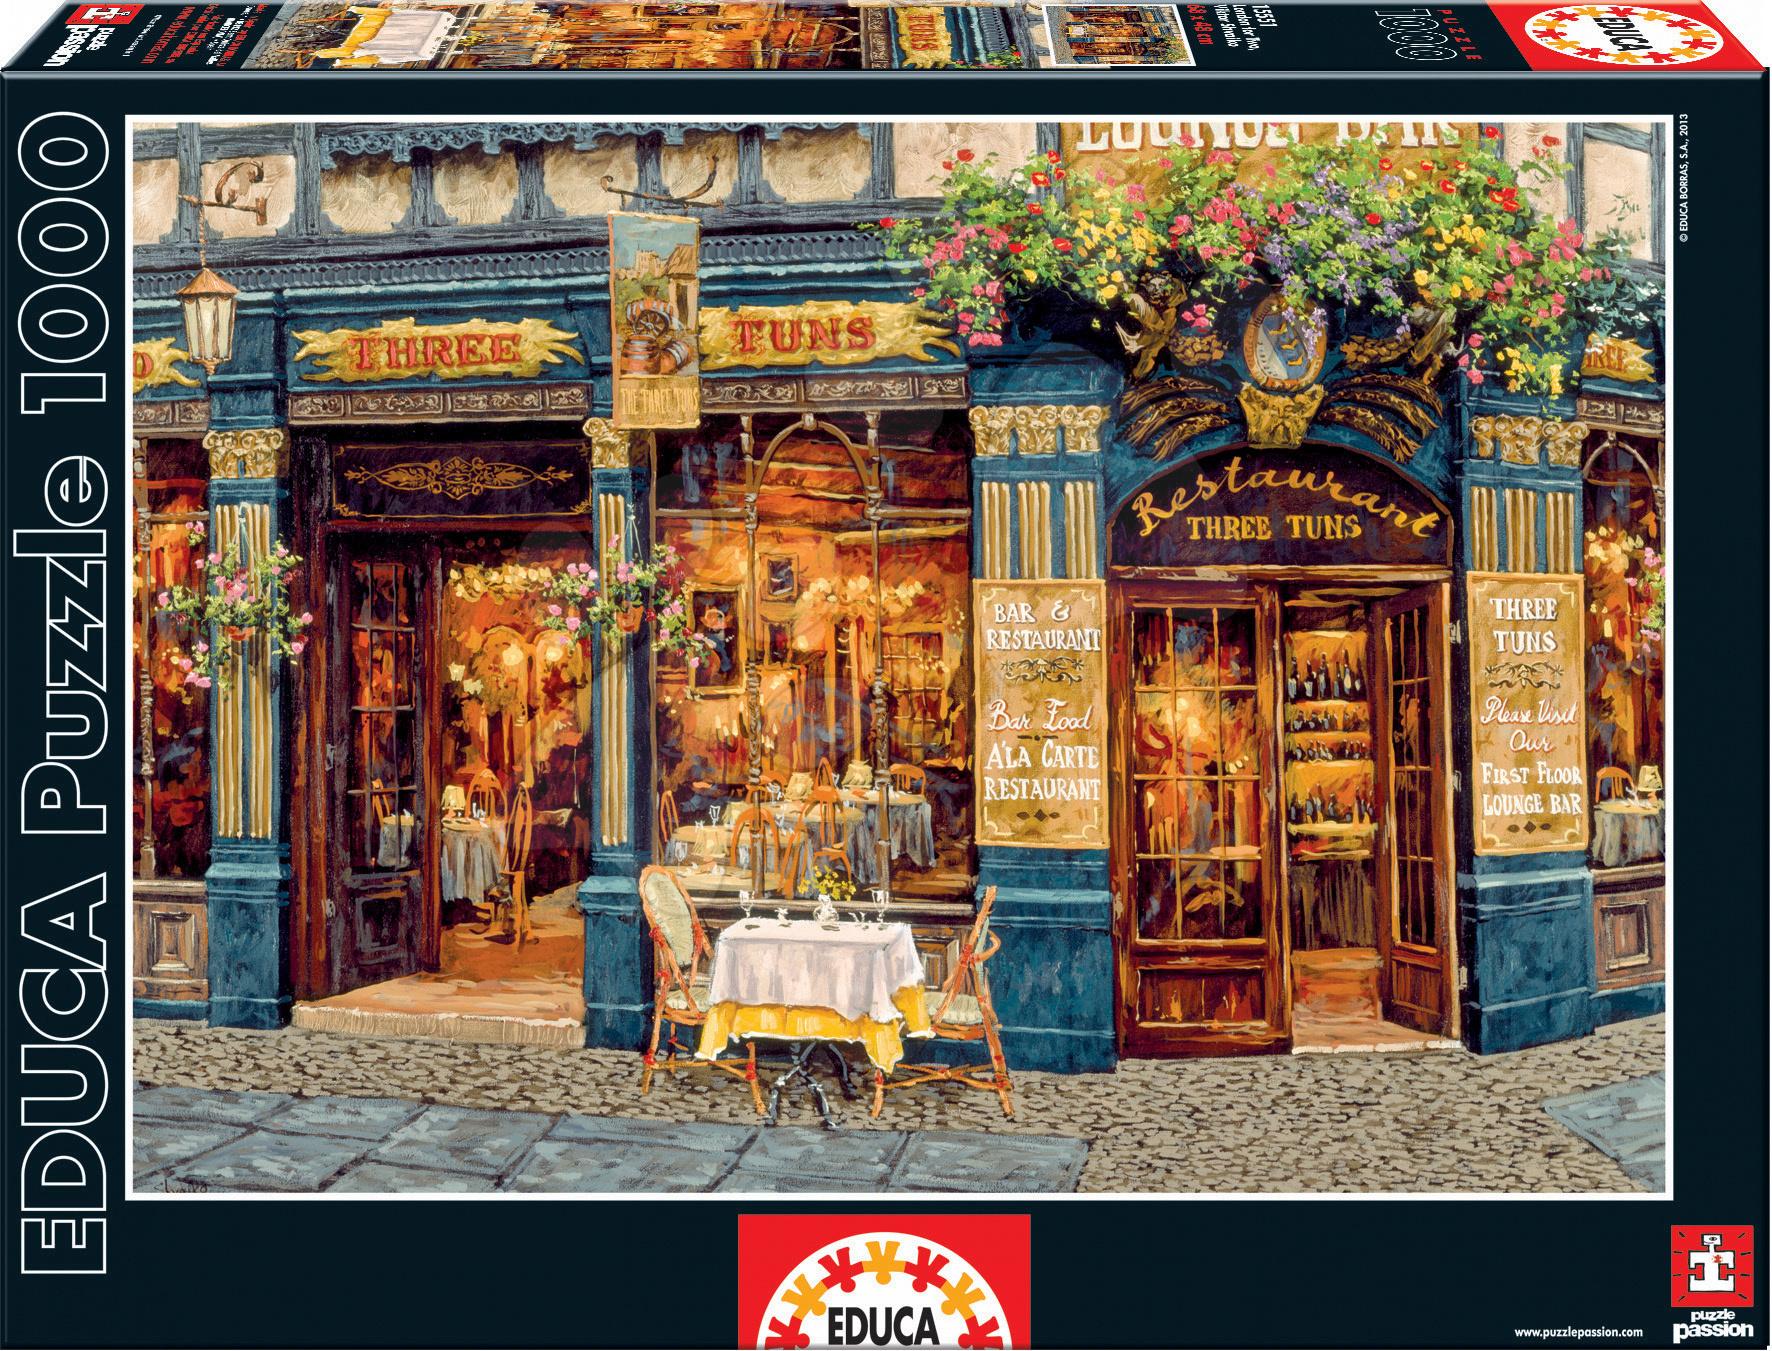 Puzzle 1000 dielne - Puzzle London For Two, Viktor Shvaiko Educa 1000 dielov od 12 rokov